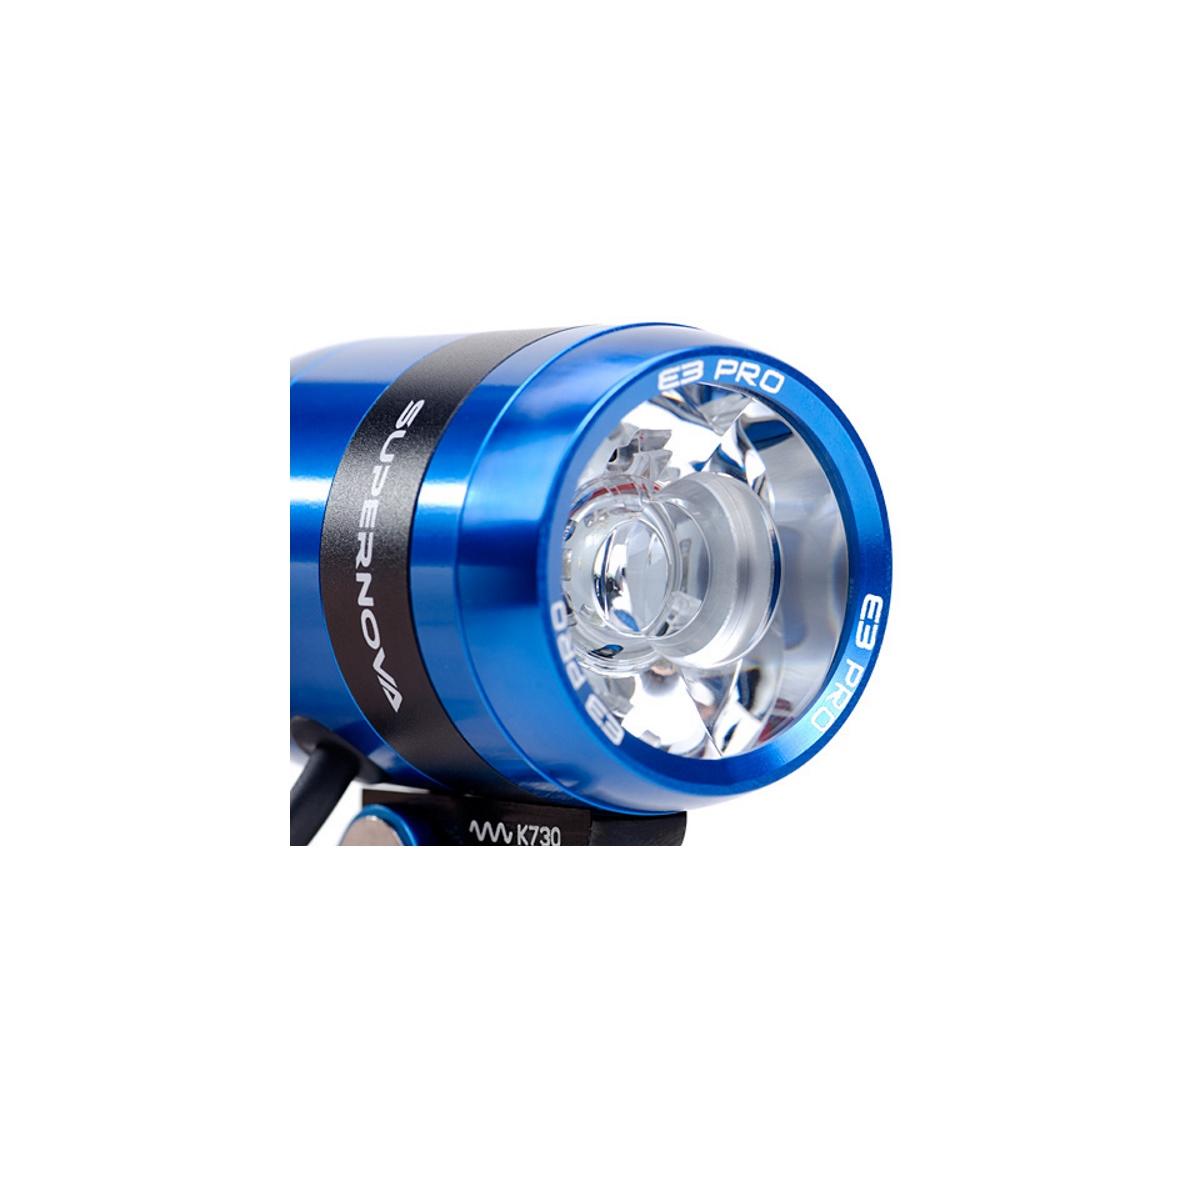 supernova e3 pro 2 led lampe f r dynamo mit stvzo zulassung bike. Black Bedroom Furniture Sets. Home Design Ideas